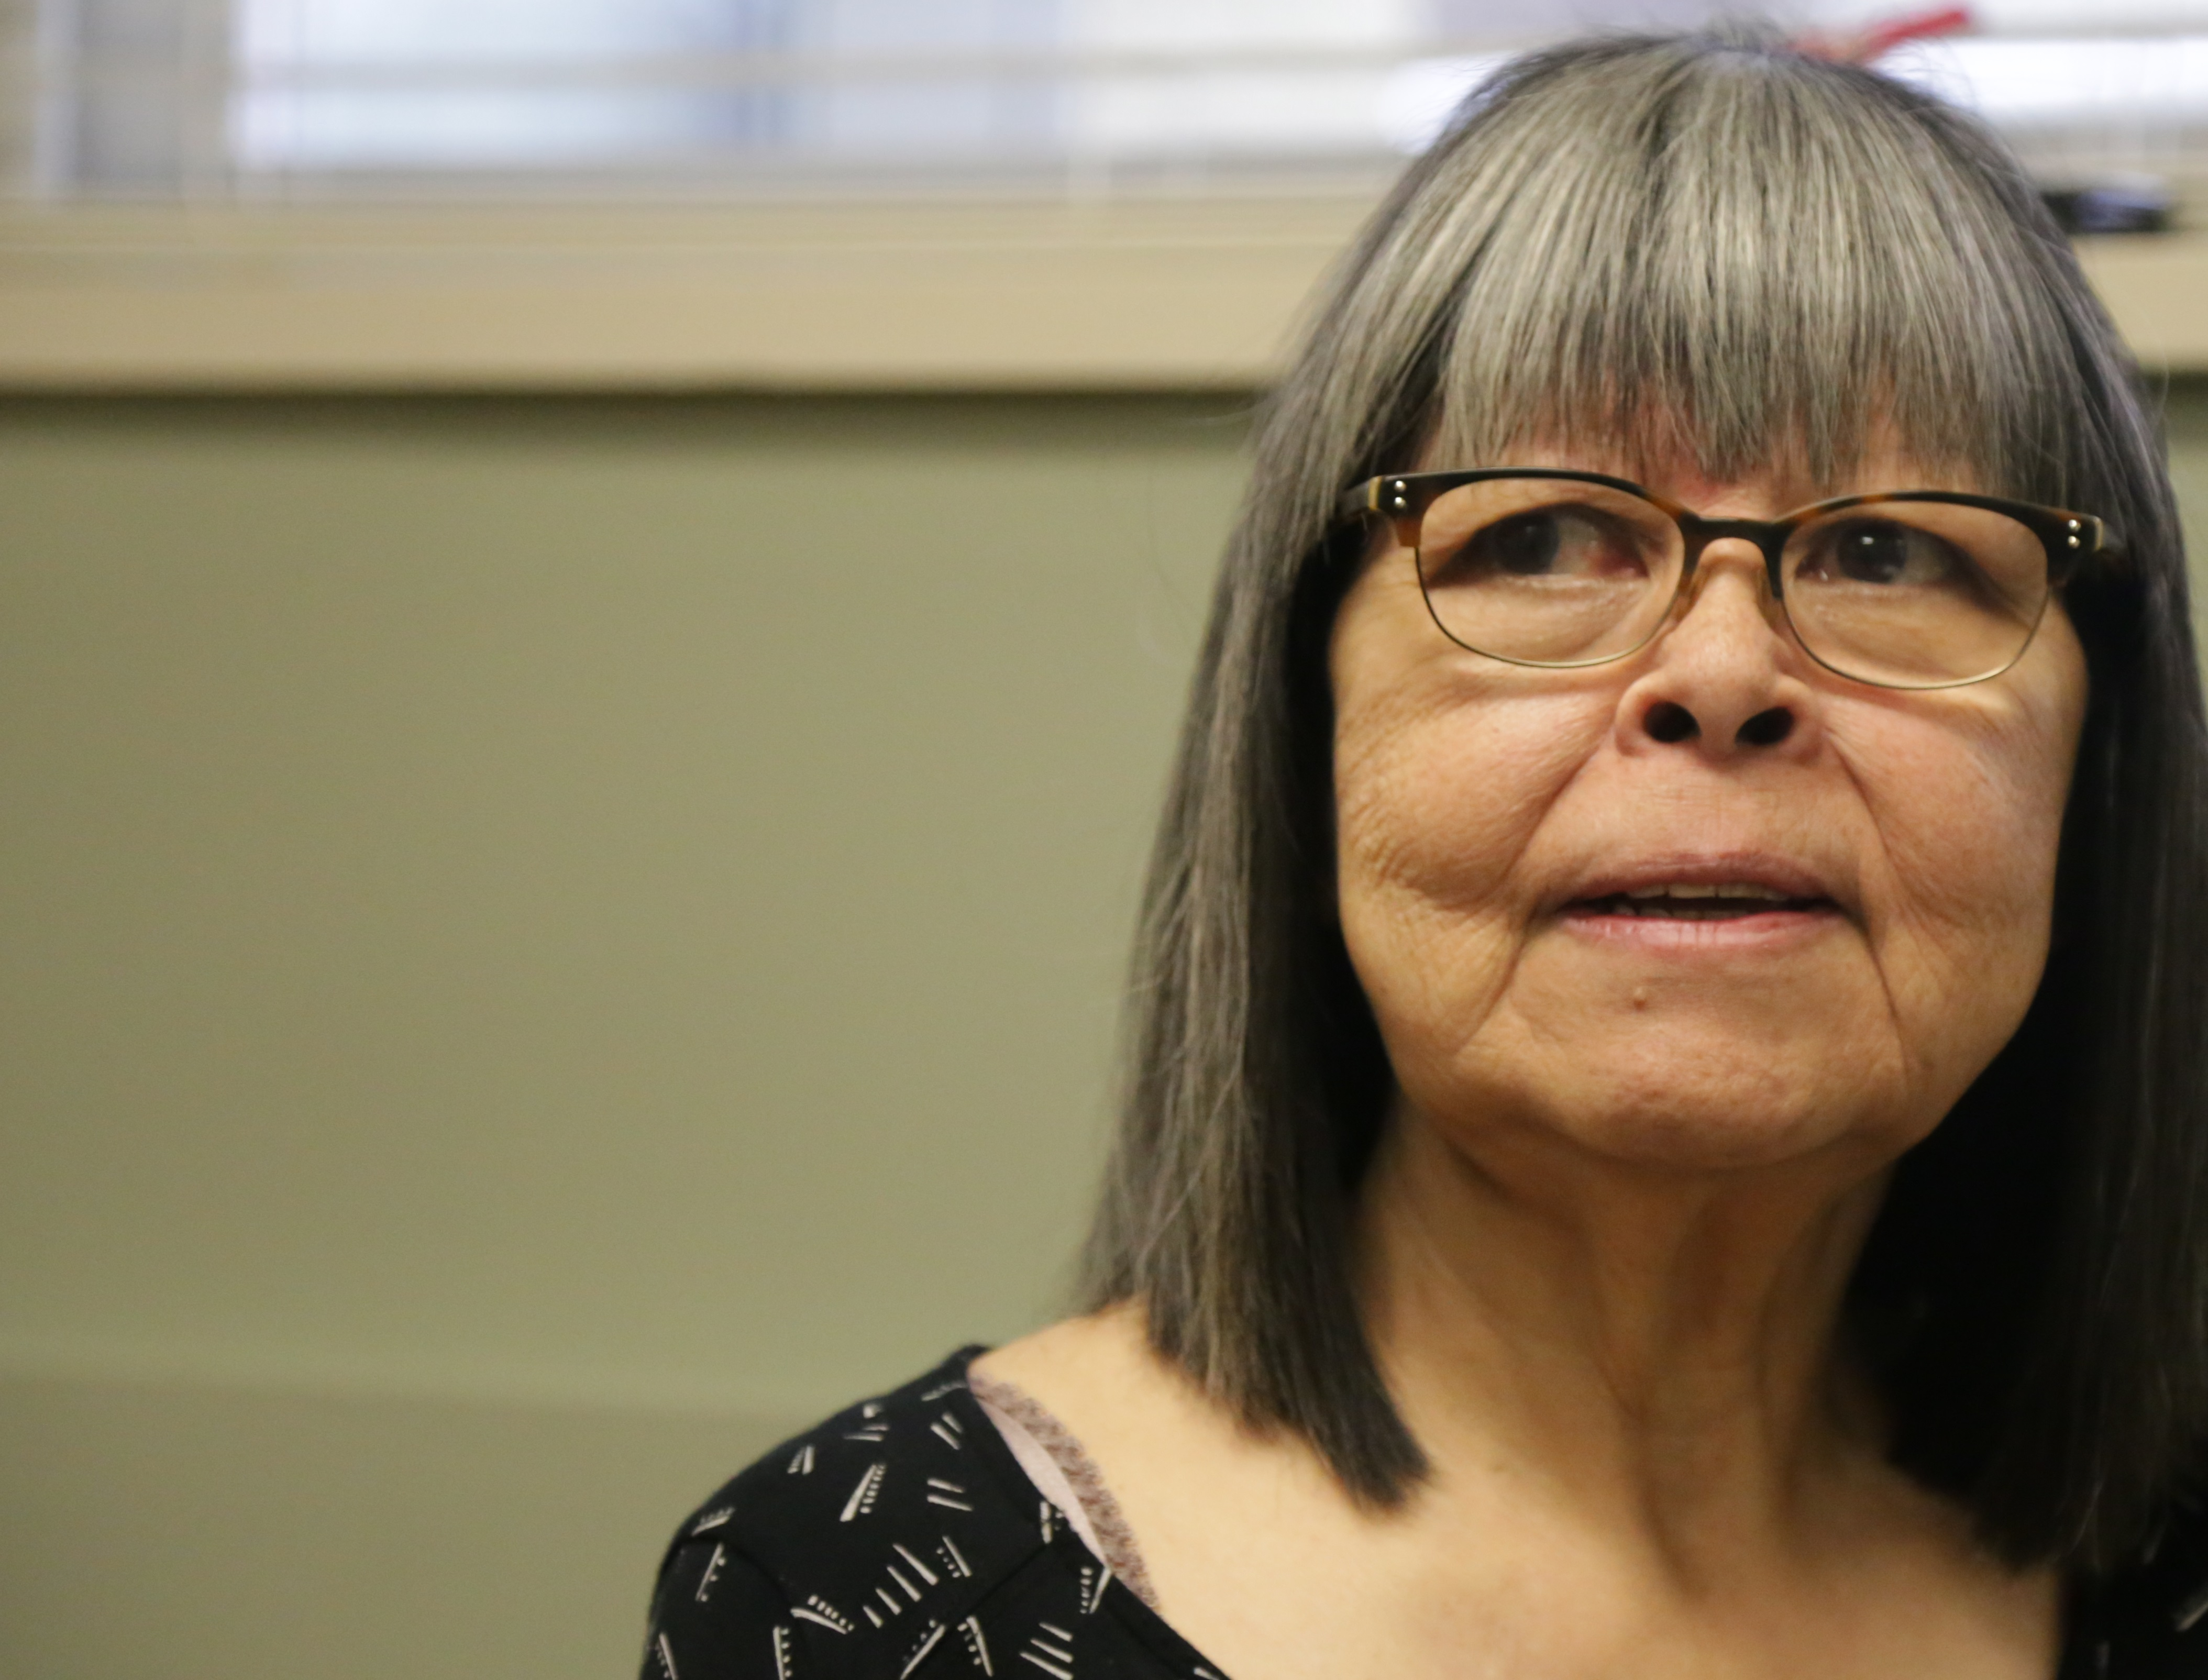 Wanda Christianson believes that language classes will help her healing journey. (Rehmatullah Sheikh/V.S. Wells)